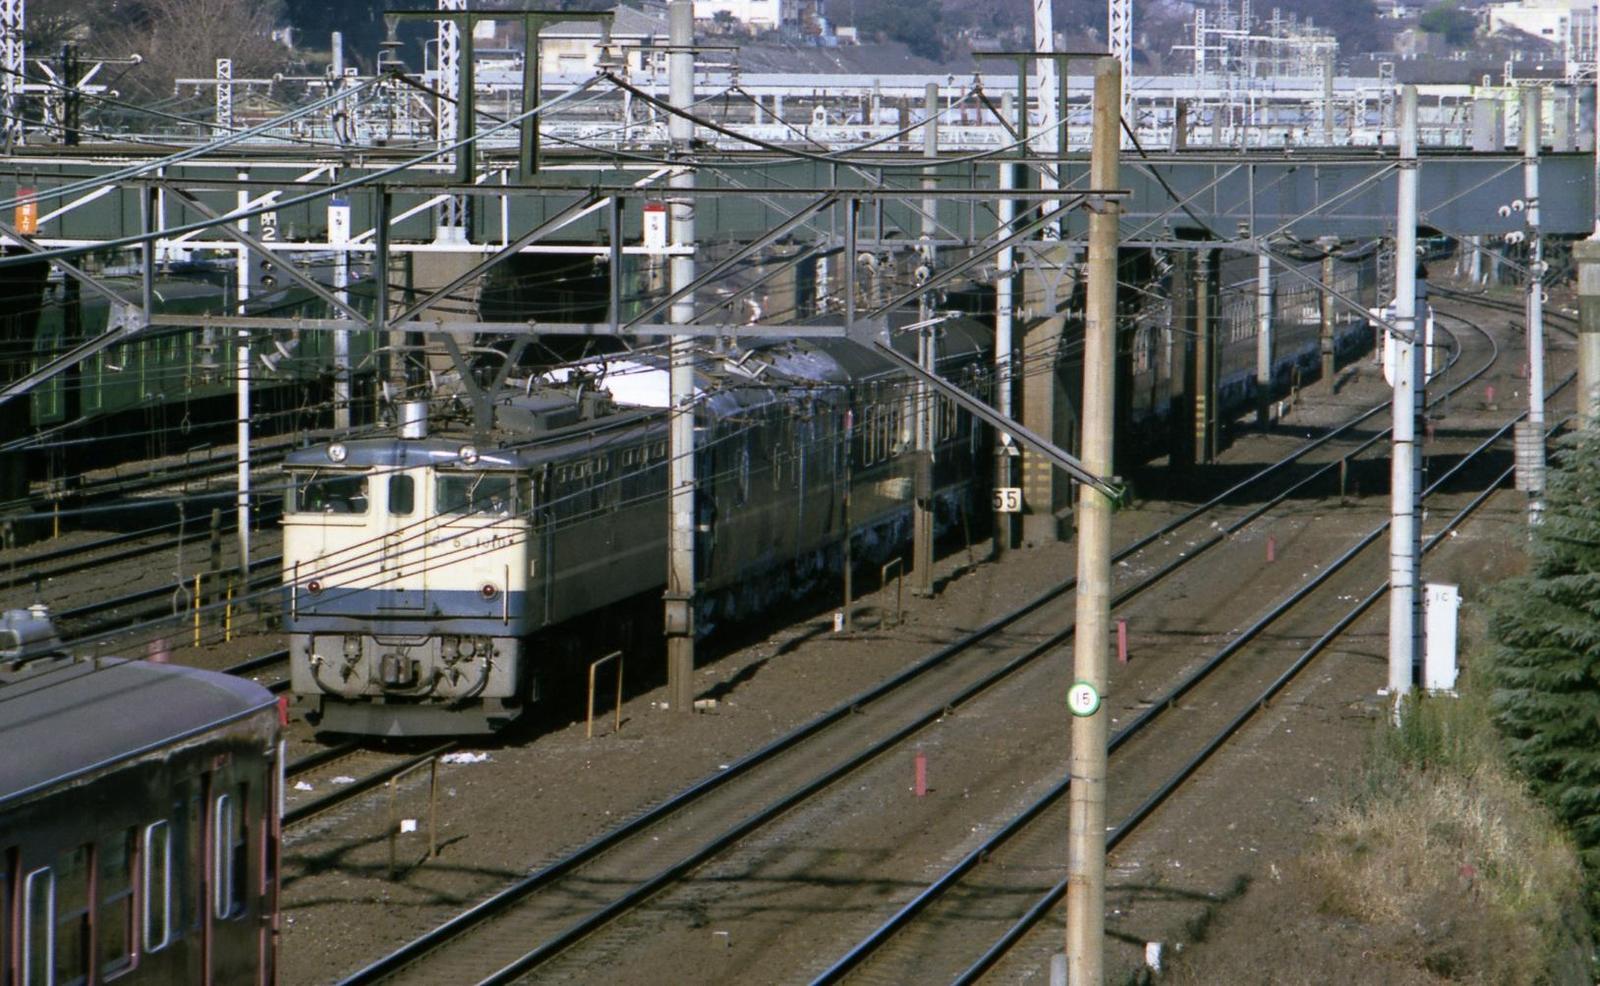 19770103a02